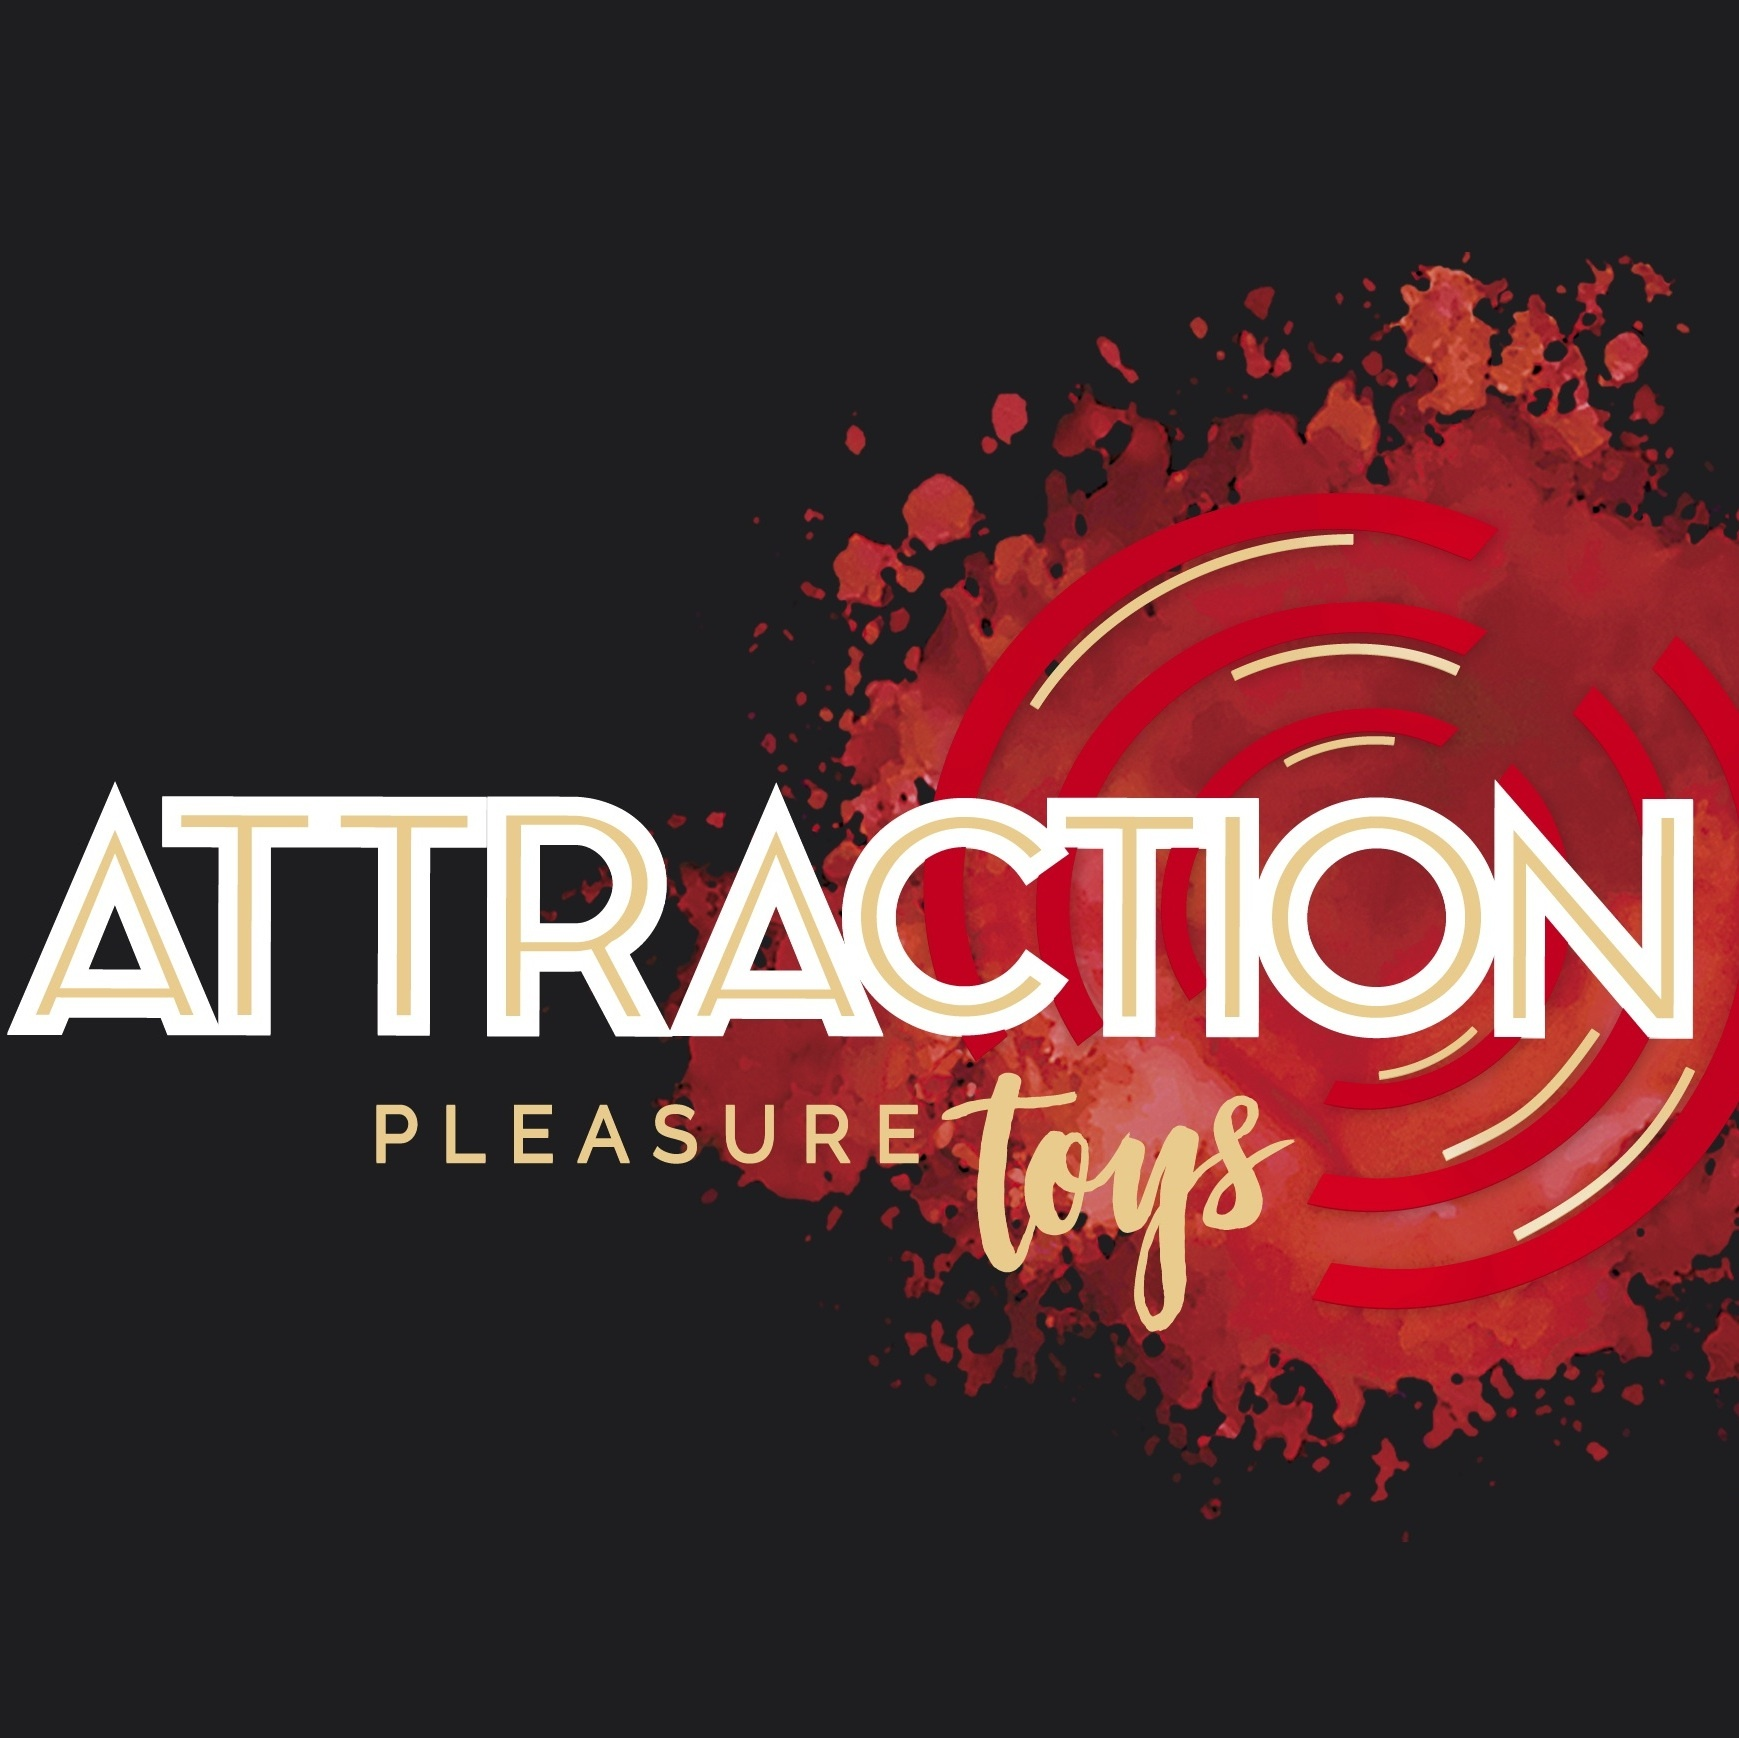 Attraction_Toys.jpg